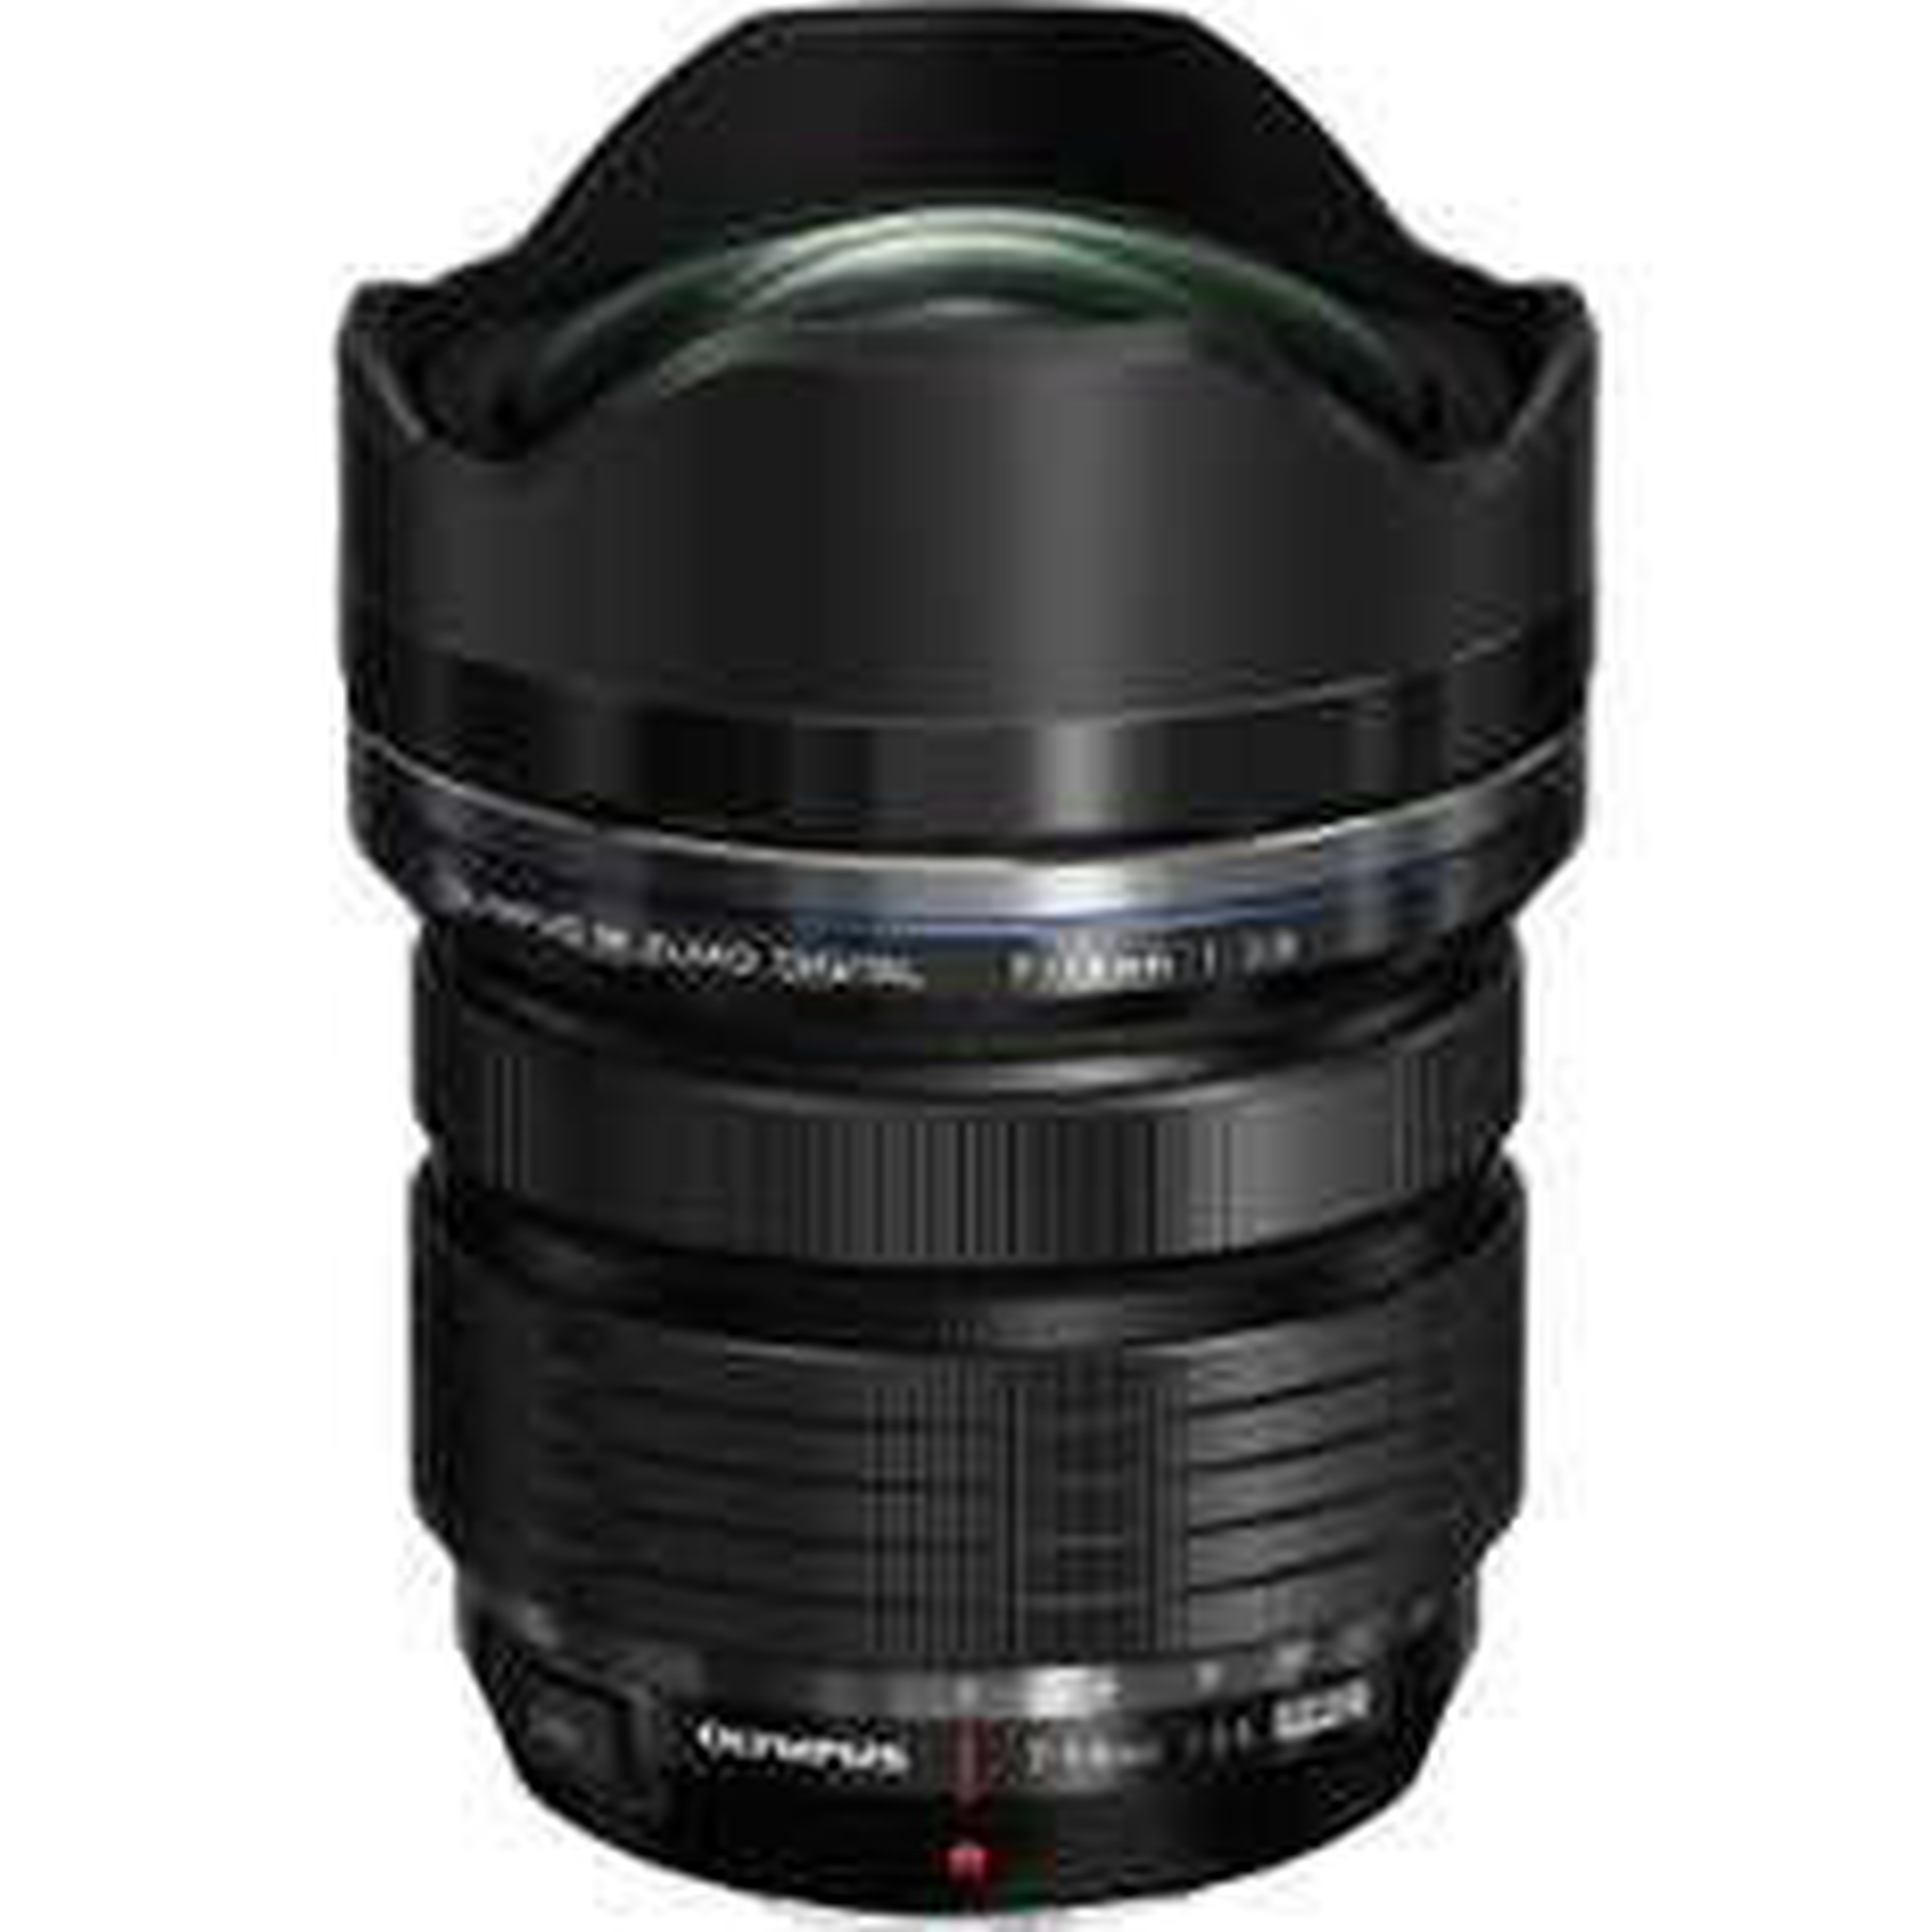 [eBay] Olympus M.ZUIKO Digital ED 7-14mm f/2.8 PRO